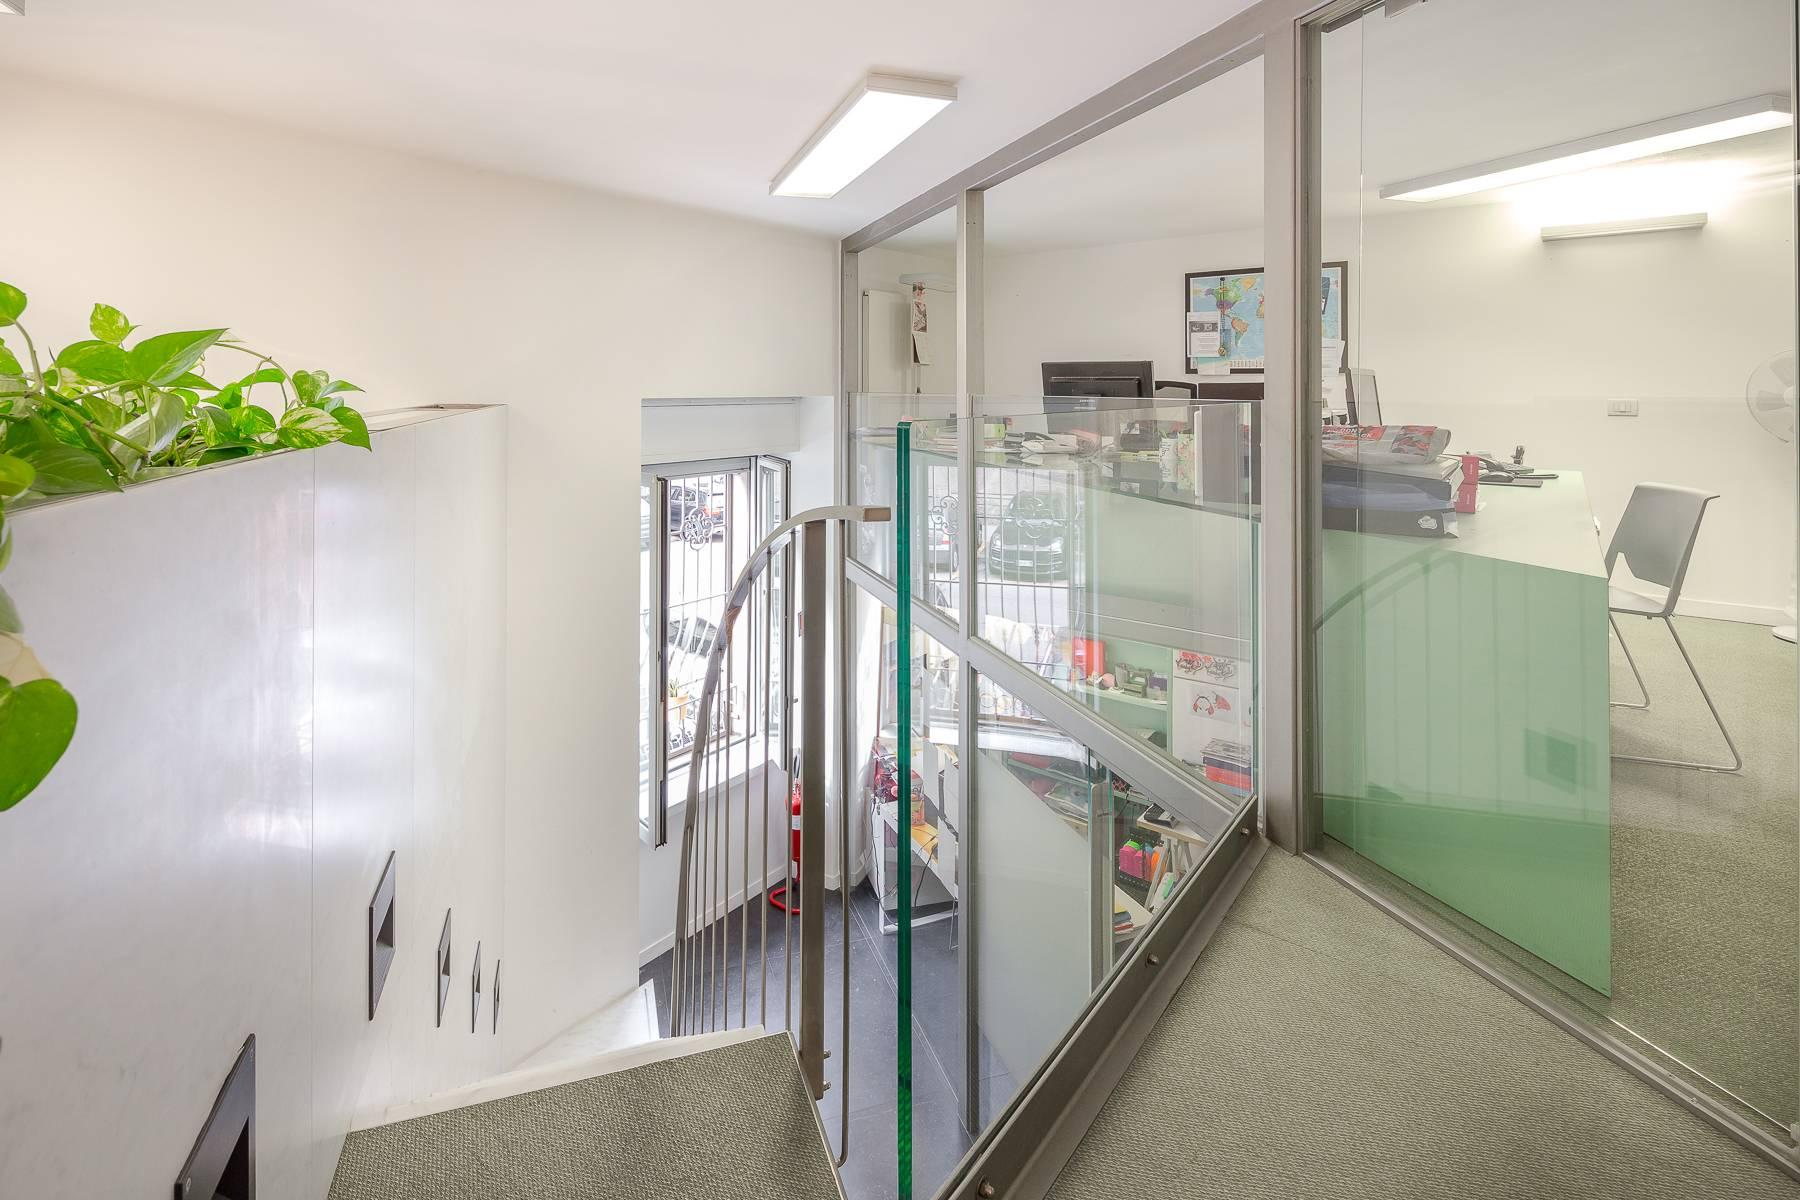 Open space office/residential property in Piazza Giovine Italia/Via Aurelio Saffi - 4